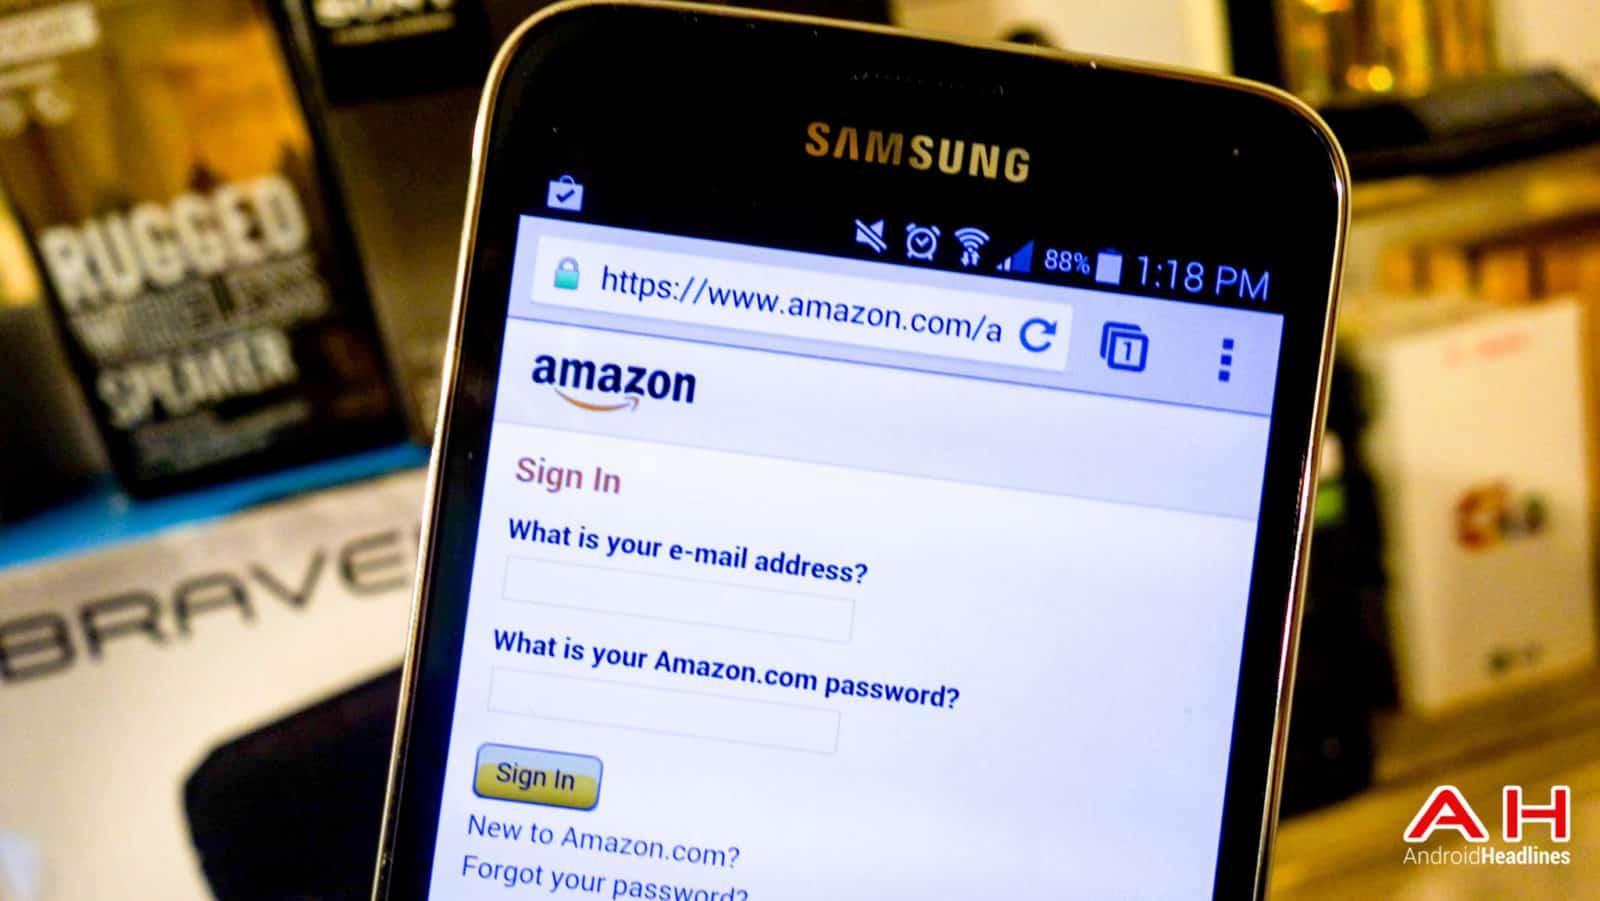 Samsung-Galaxy-S5-Amazon-Single-Sign-On-AH-1